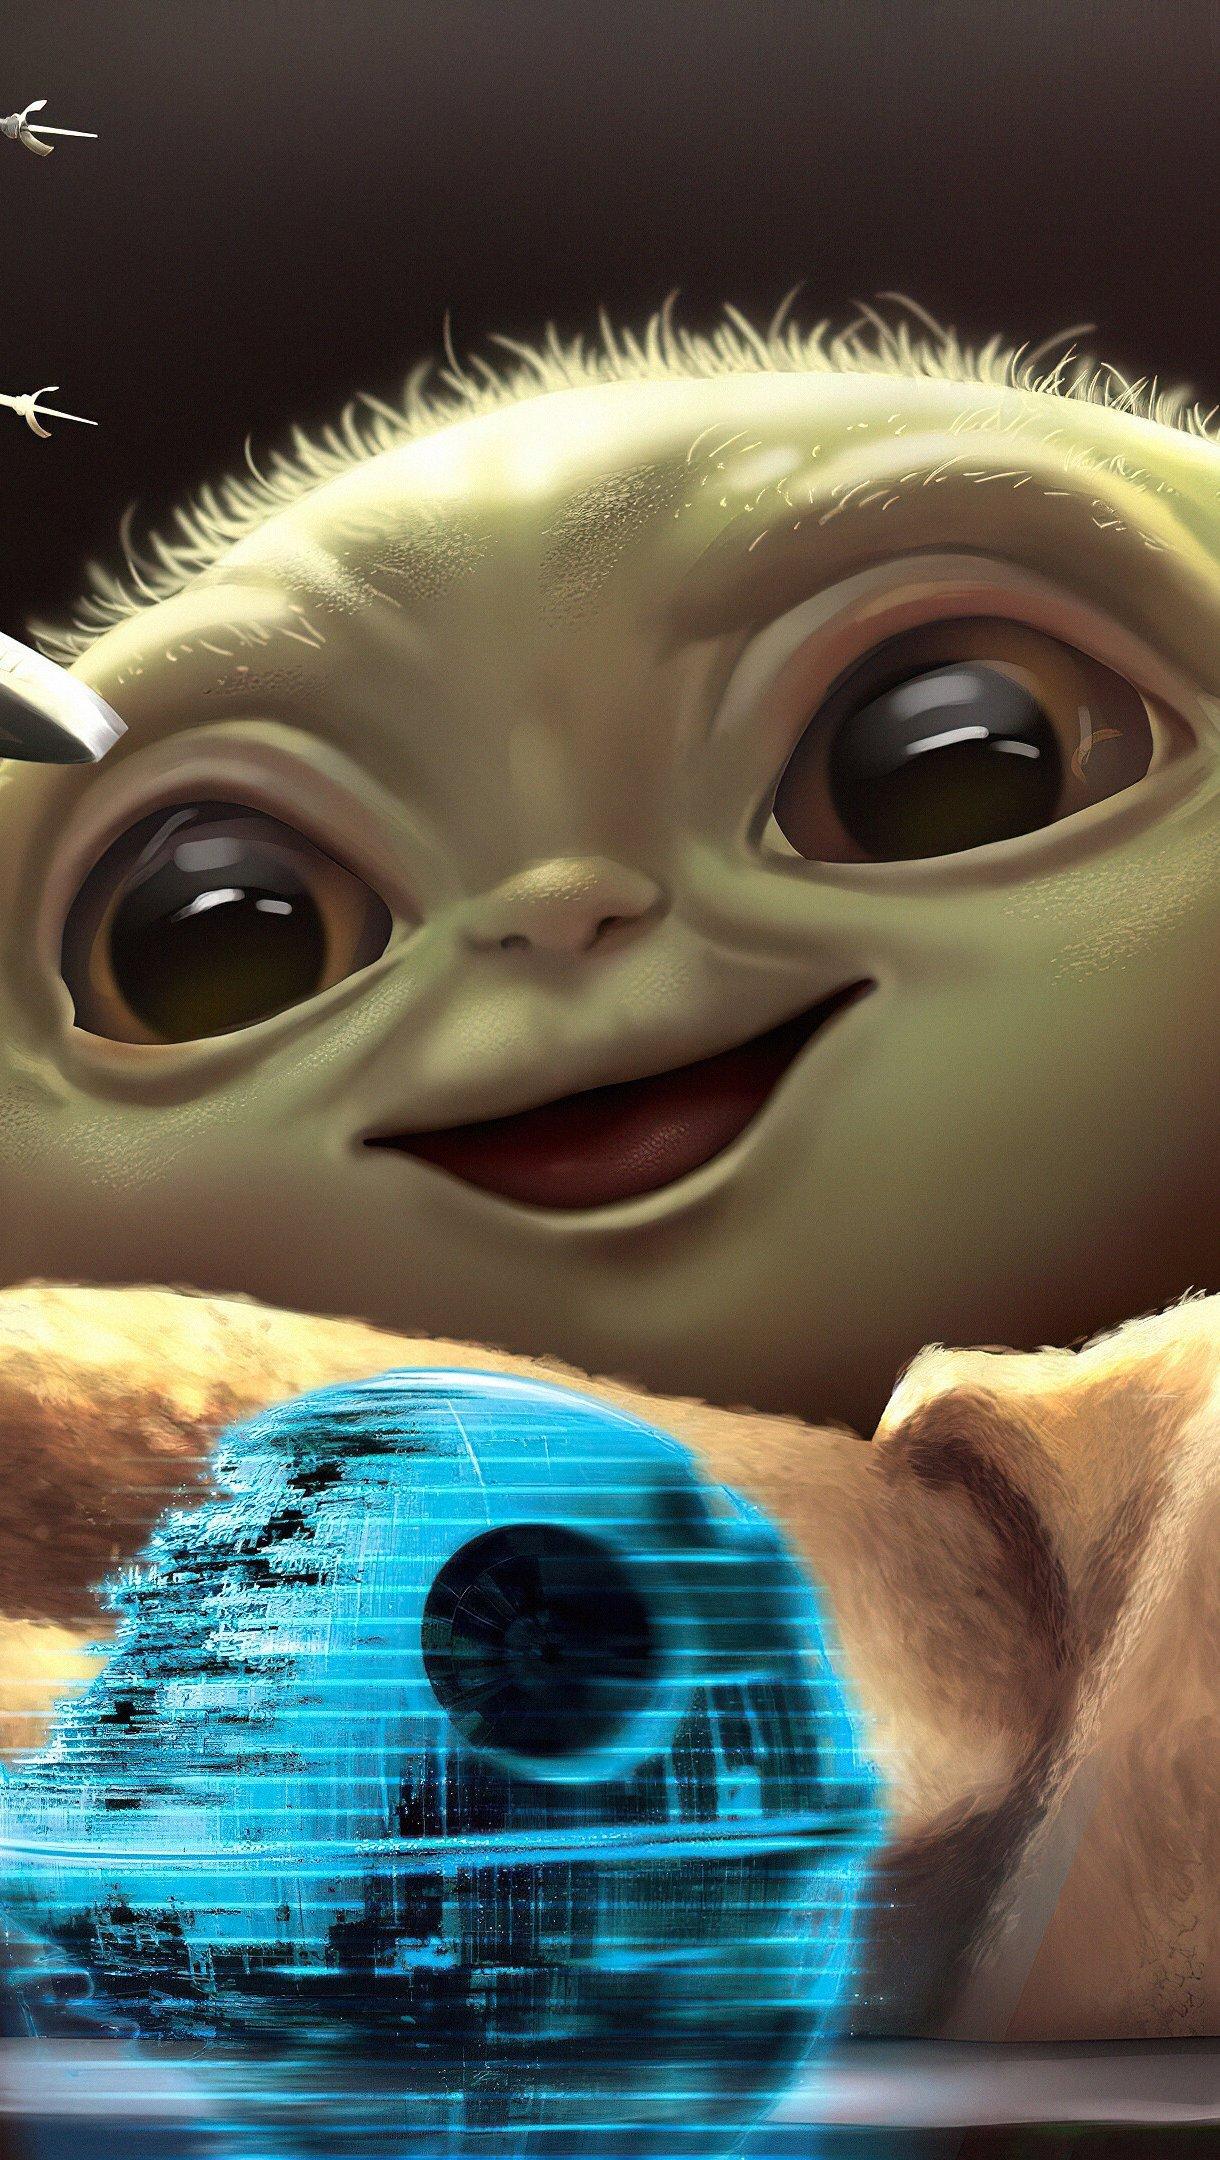 Fondos de pantalla Yoda bebé jugando Vertical